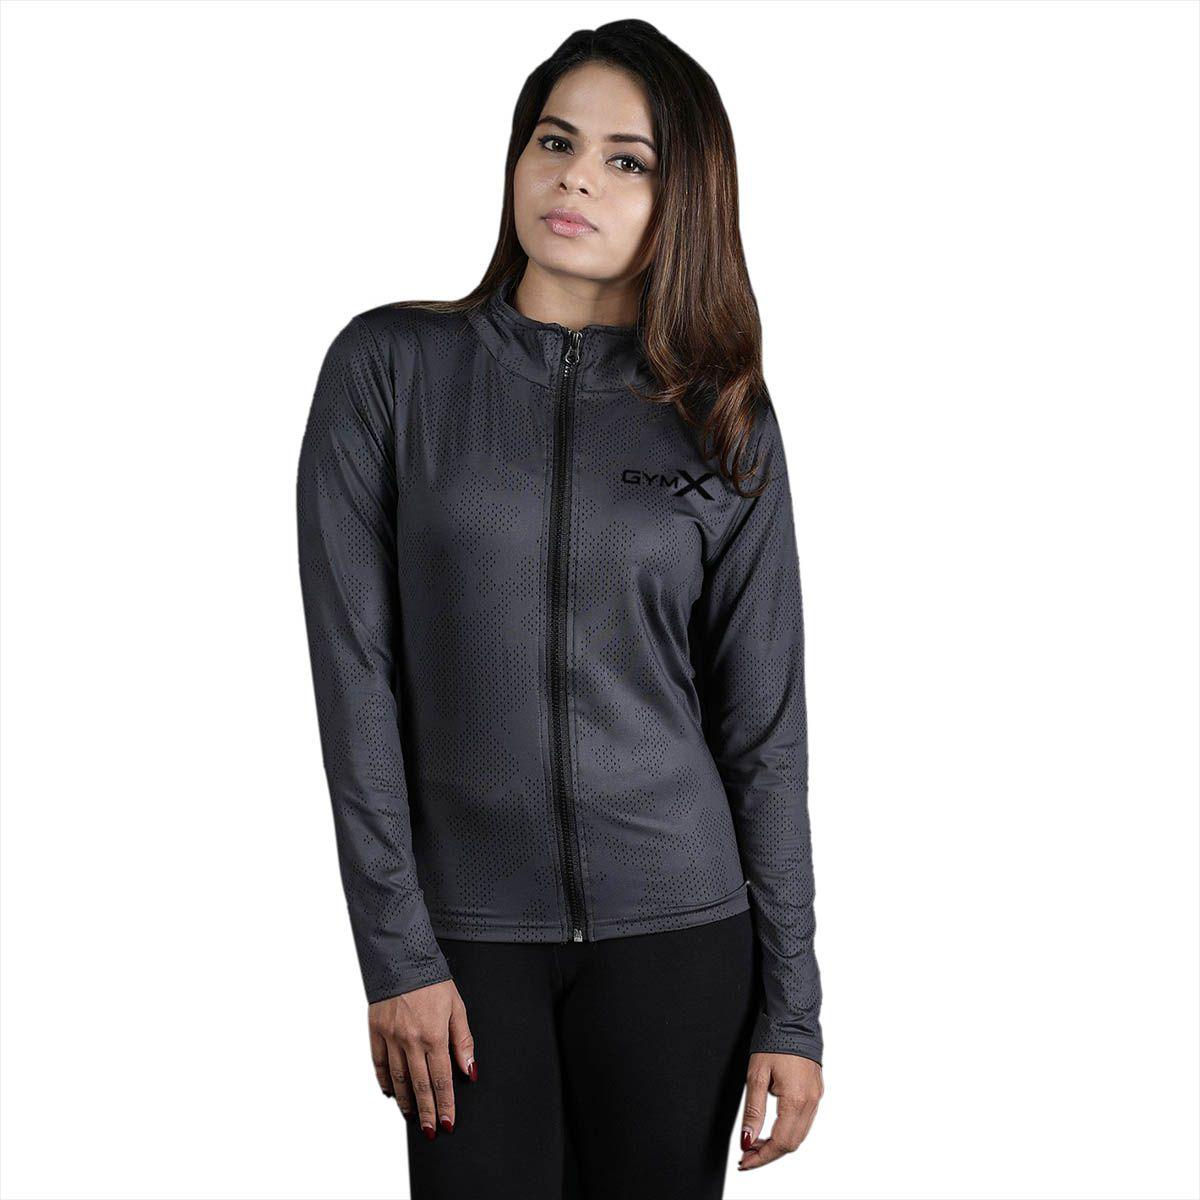 GymX Womens Royal Grey Full Zip Jacket- Athena Series